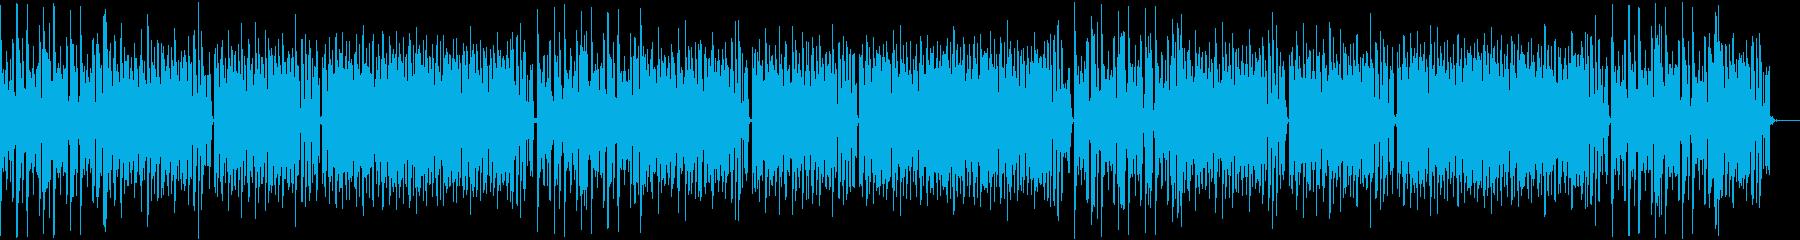 Comical / Quiet Karaoke's reproduced waveform